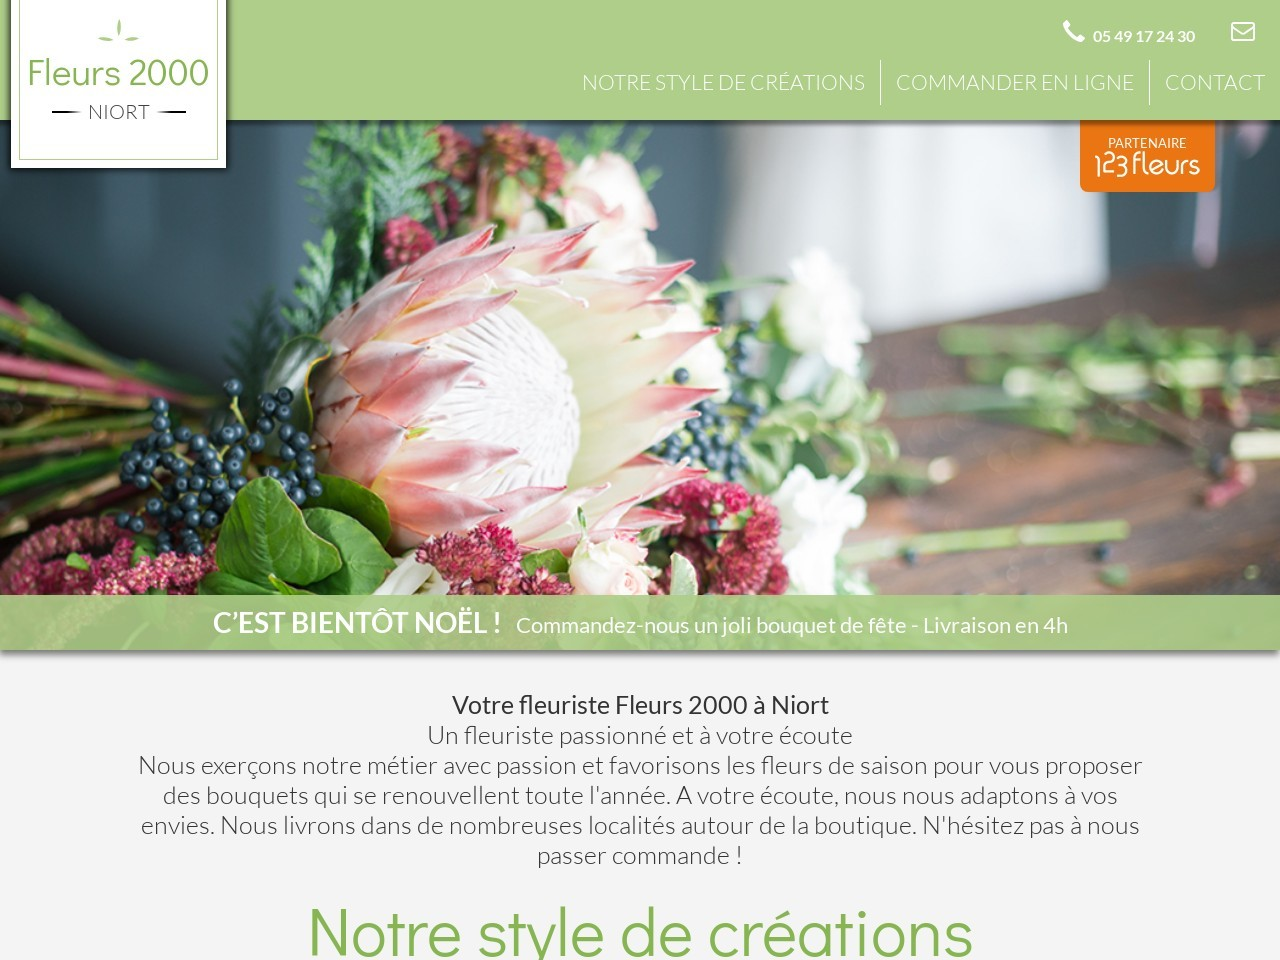 Site fleuriste Fleurs 2000 - 123fleurs